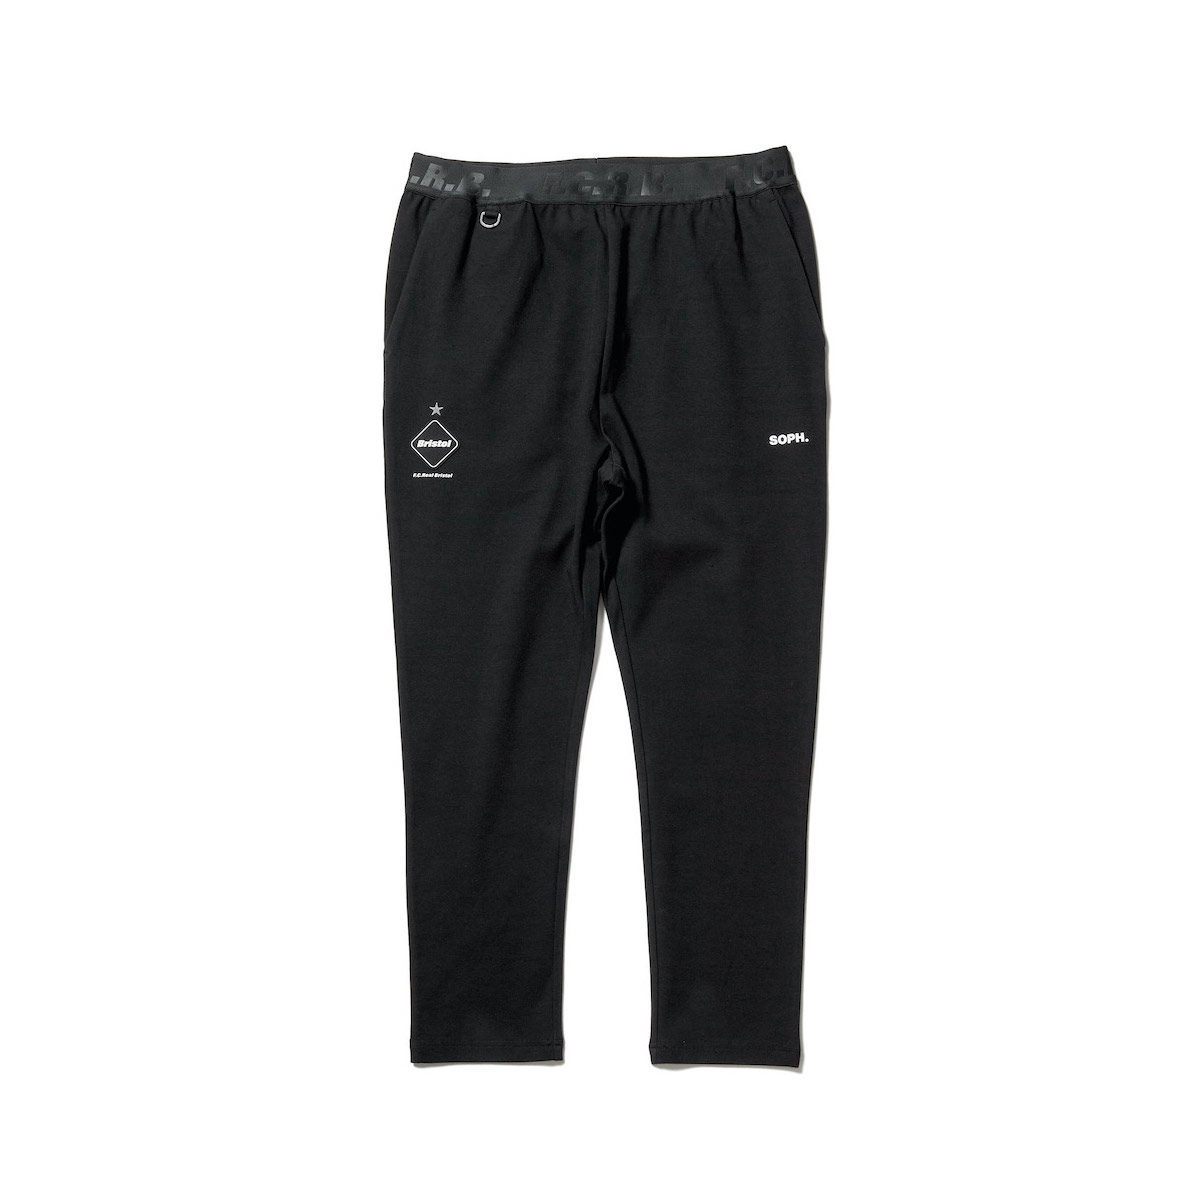 F.C.Real Bristol / RELAX FIT LONG PANTS (Black)